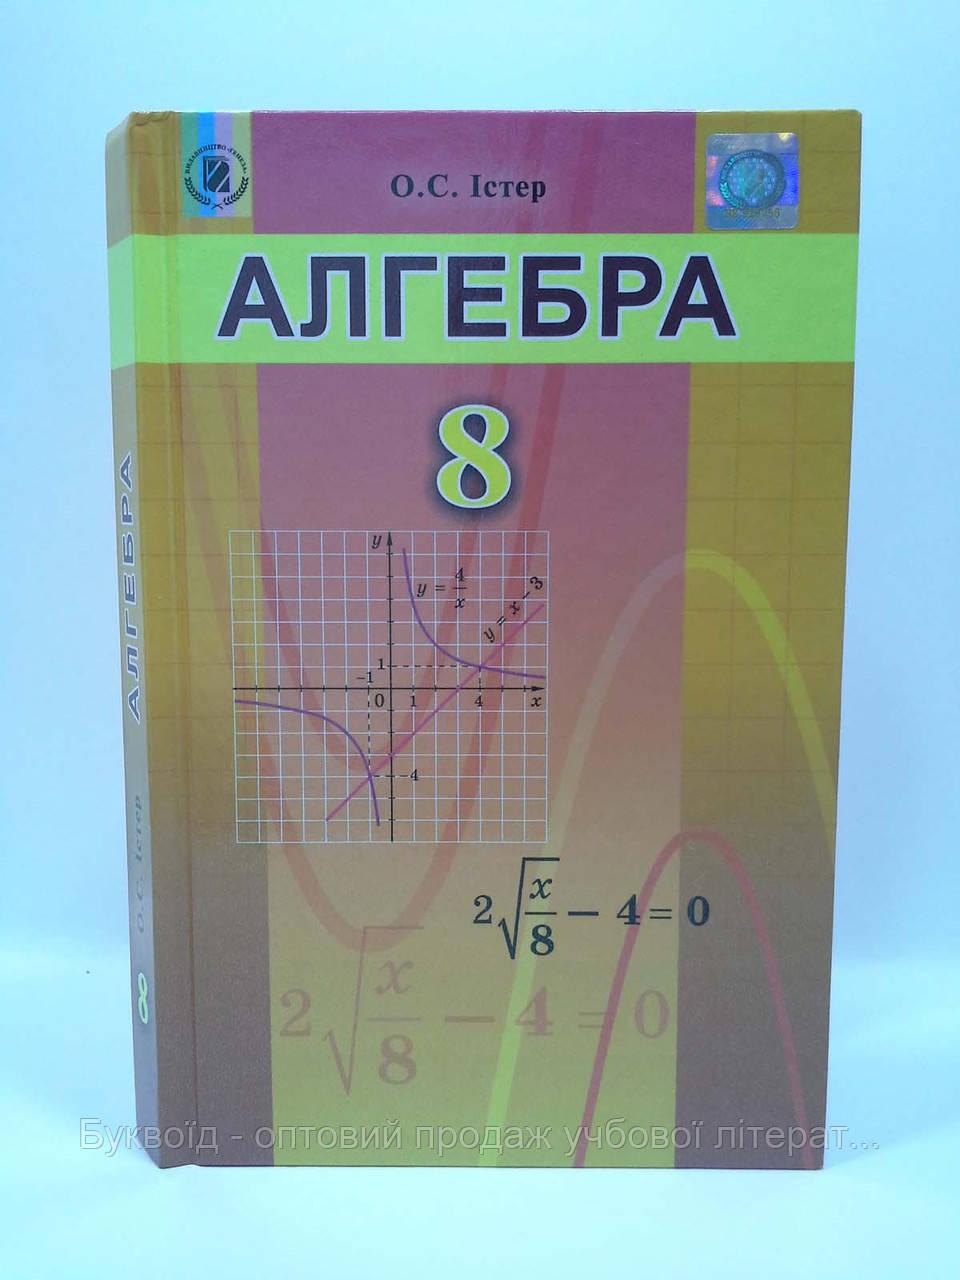 Алгебра 8 клас Підручник Істер Генеза ISBN 978-966-11-0699-3